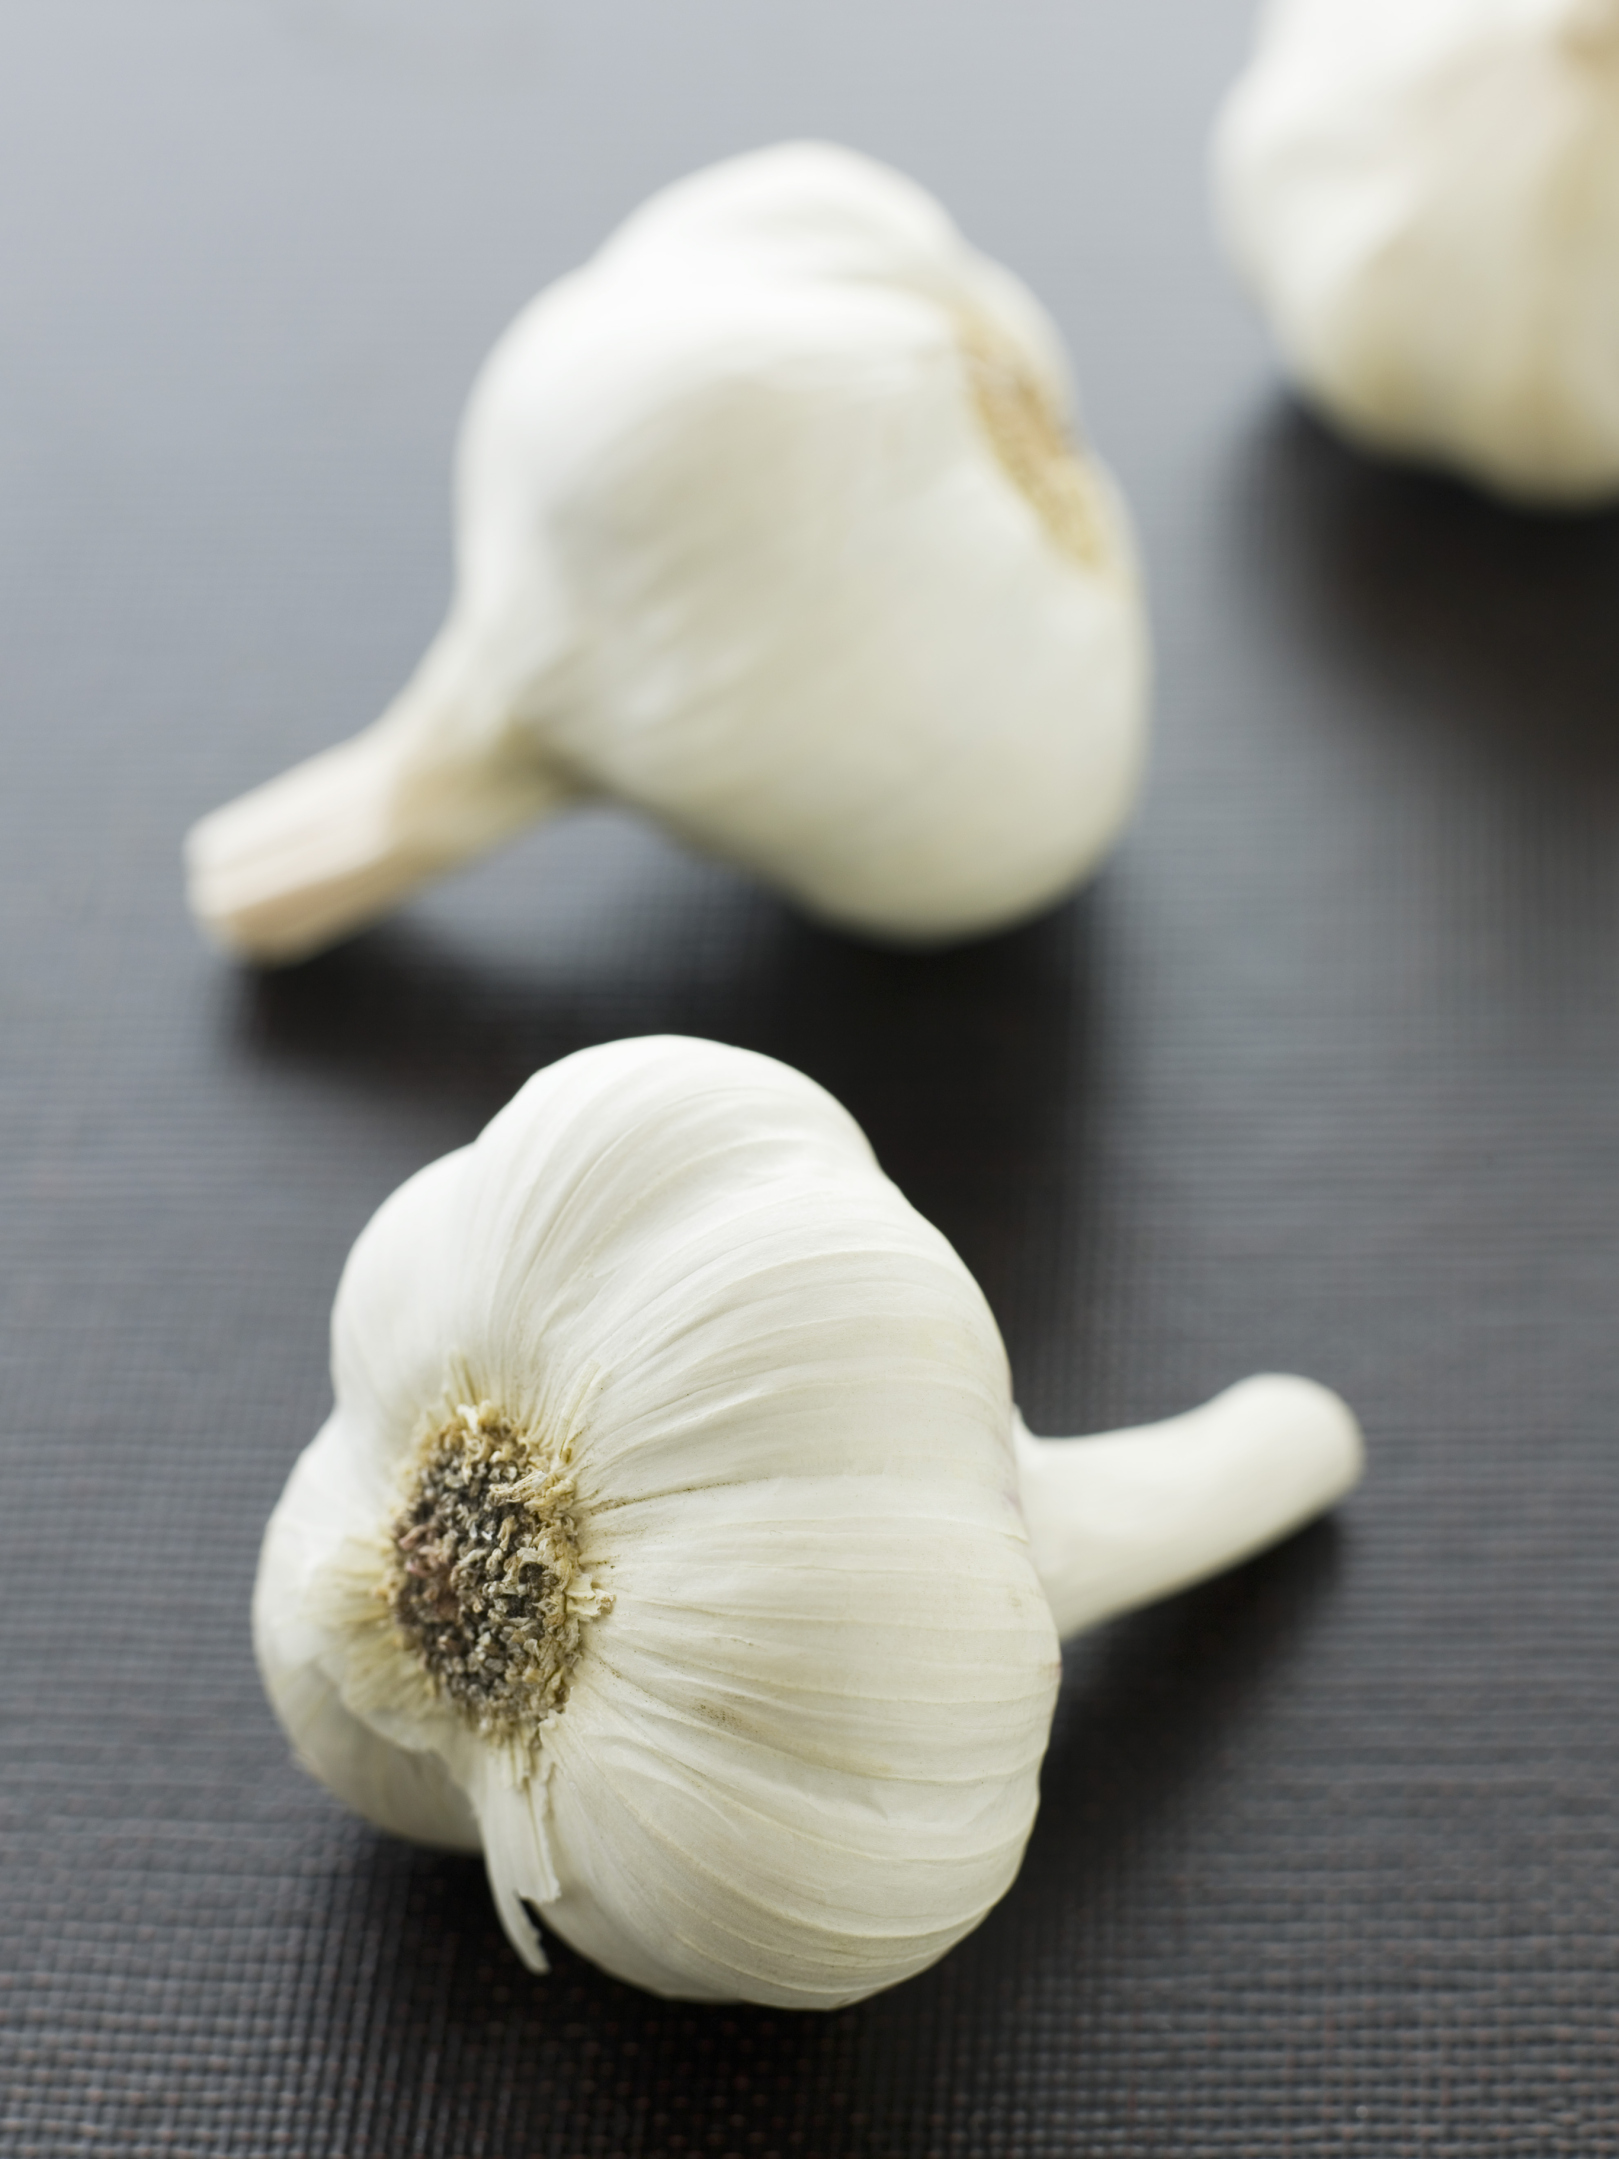 Skin Benefits From Garlic